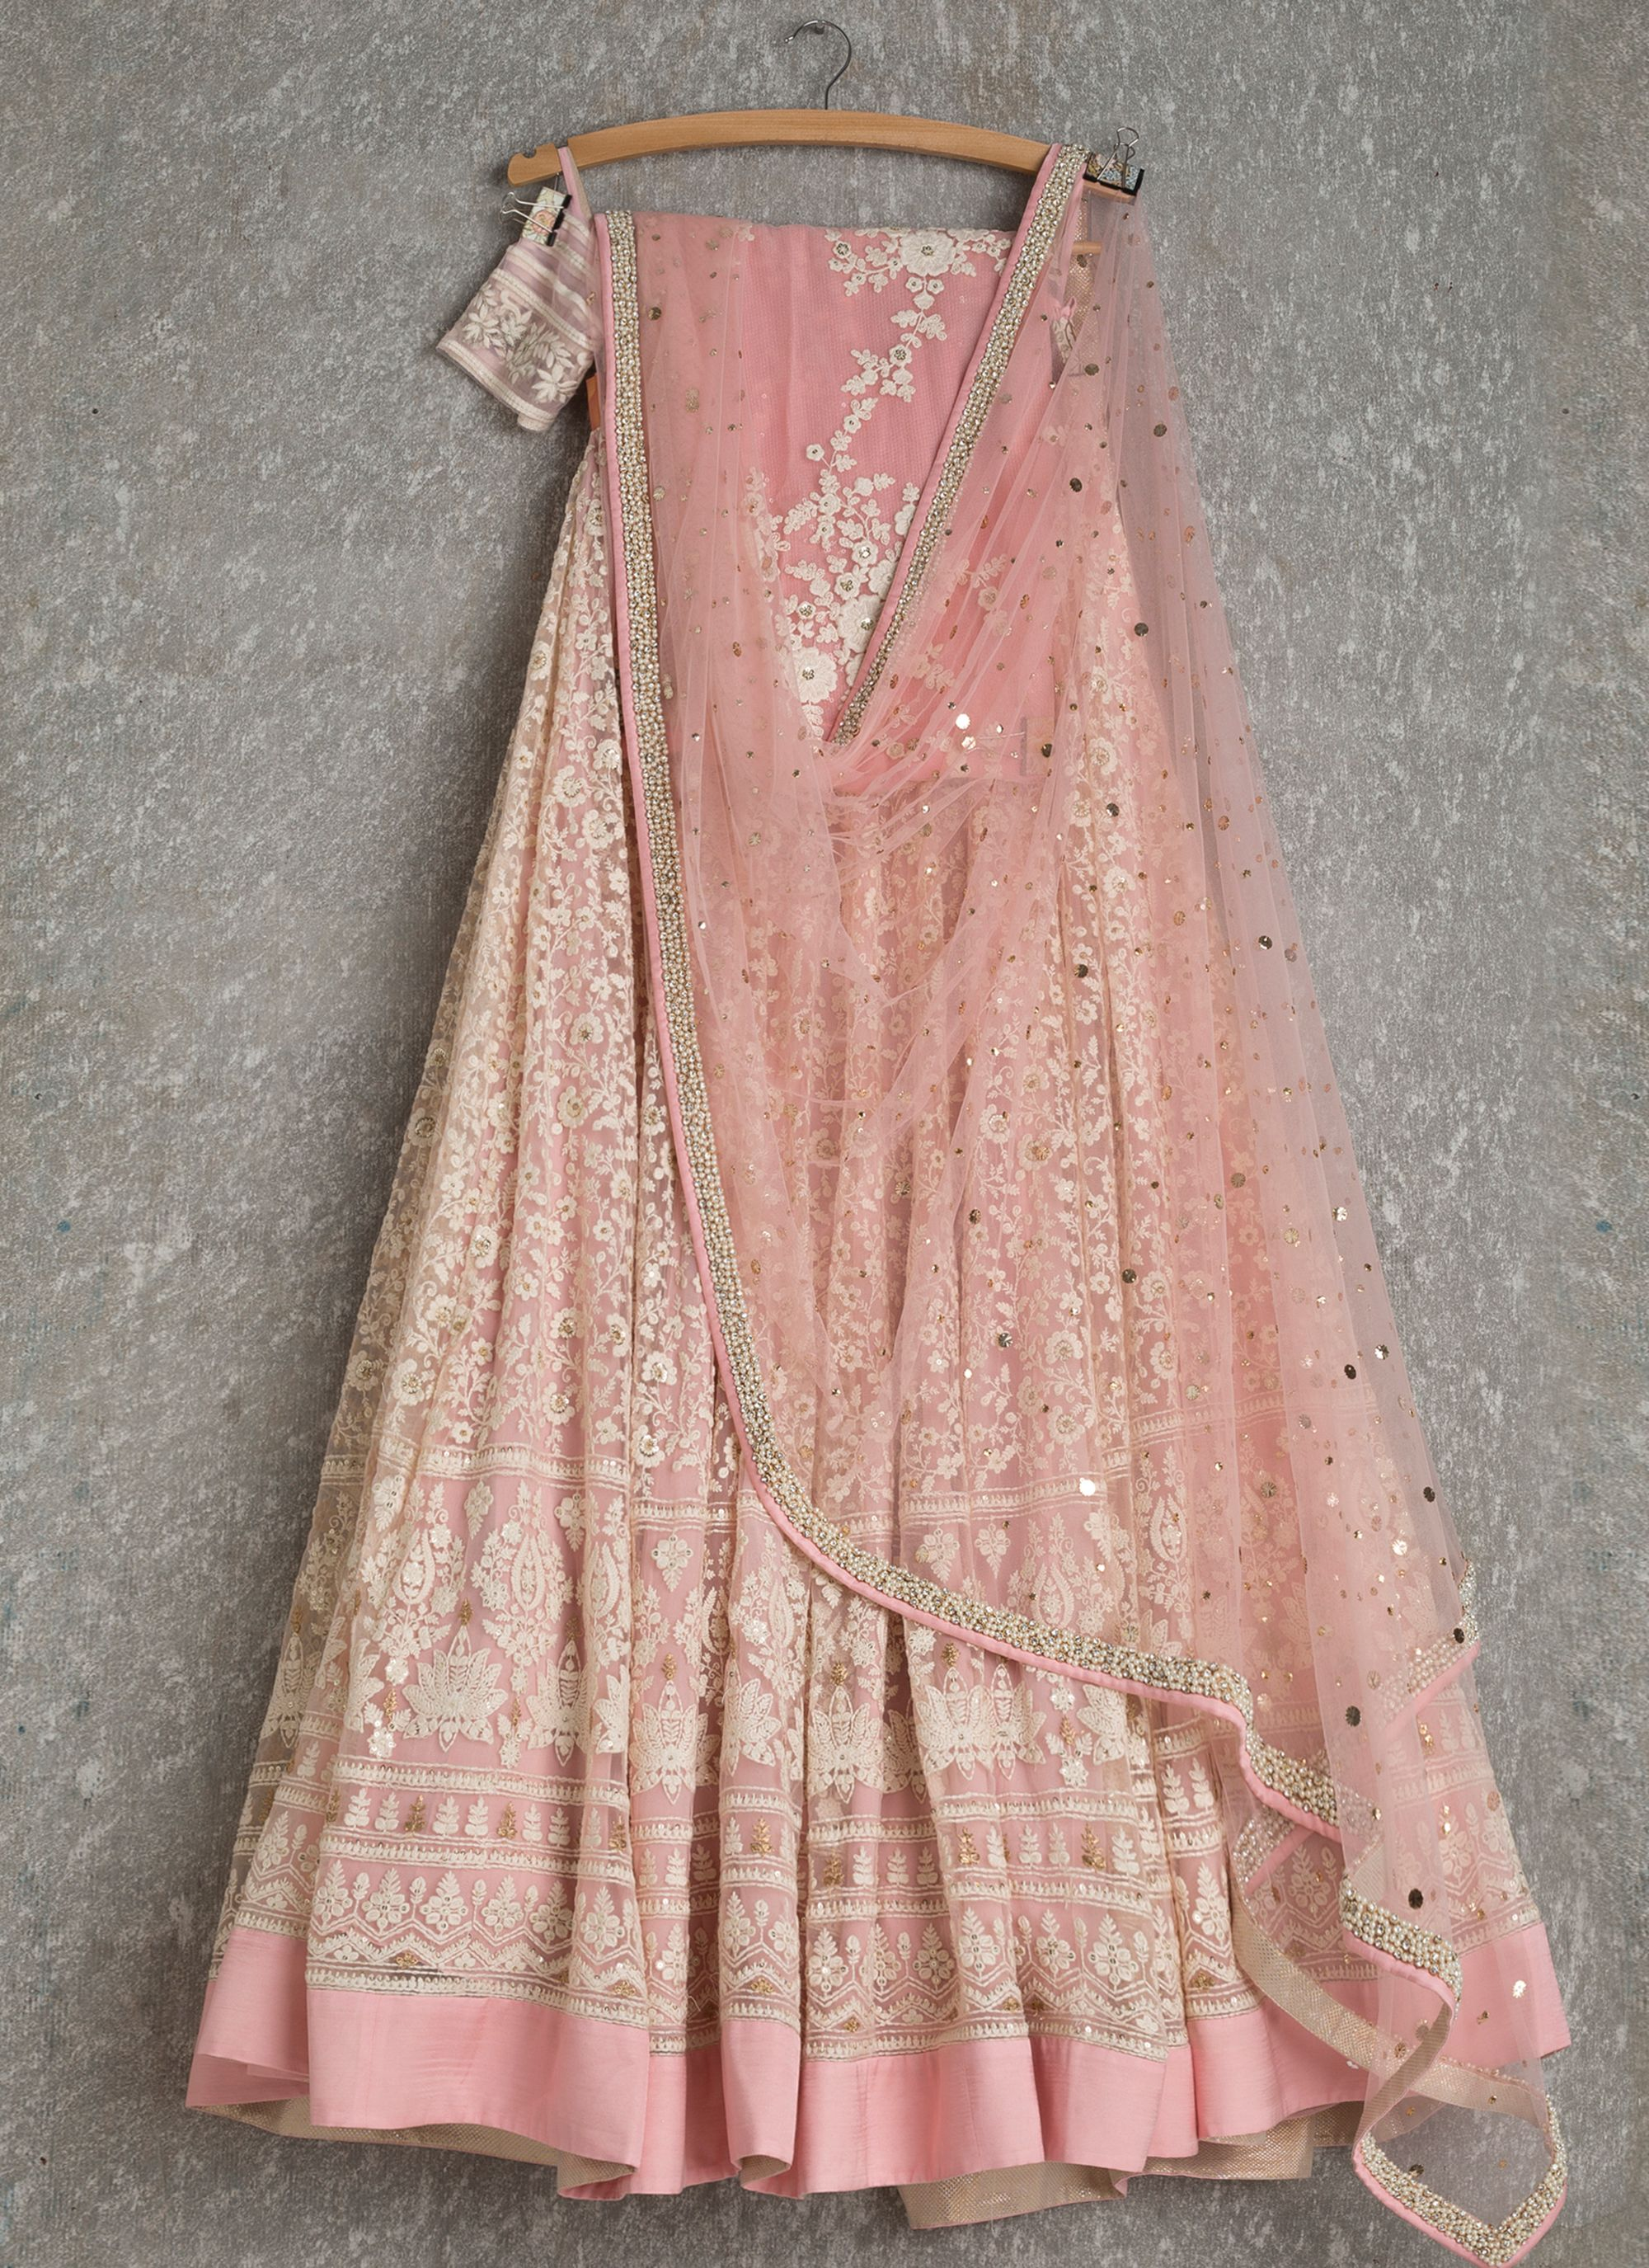 Pin de Arzoo Shyam en dresses...<3 | Pinterest | Falda